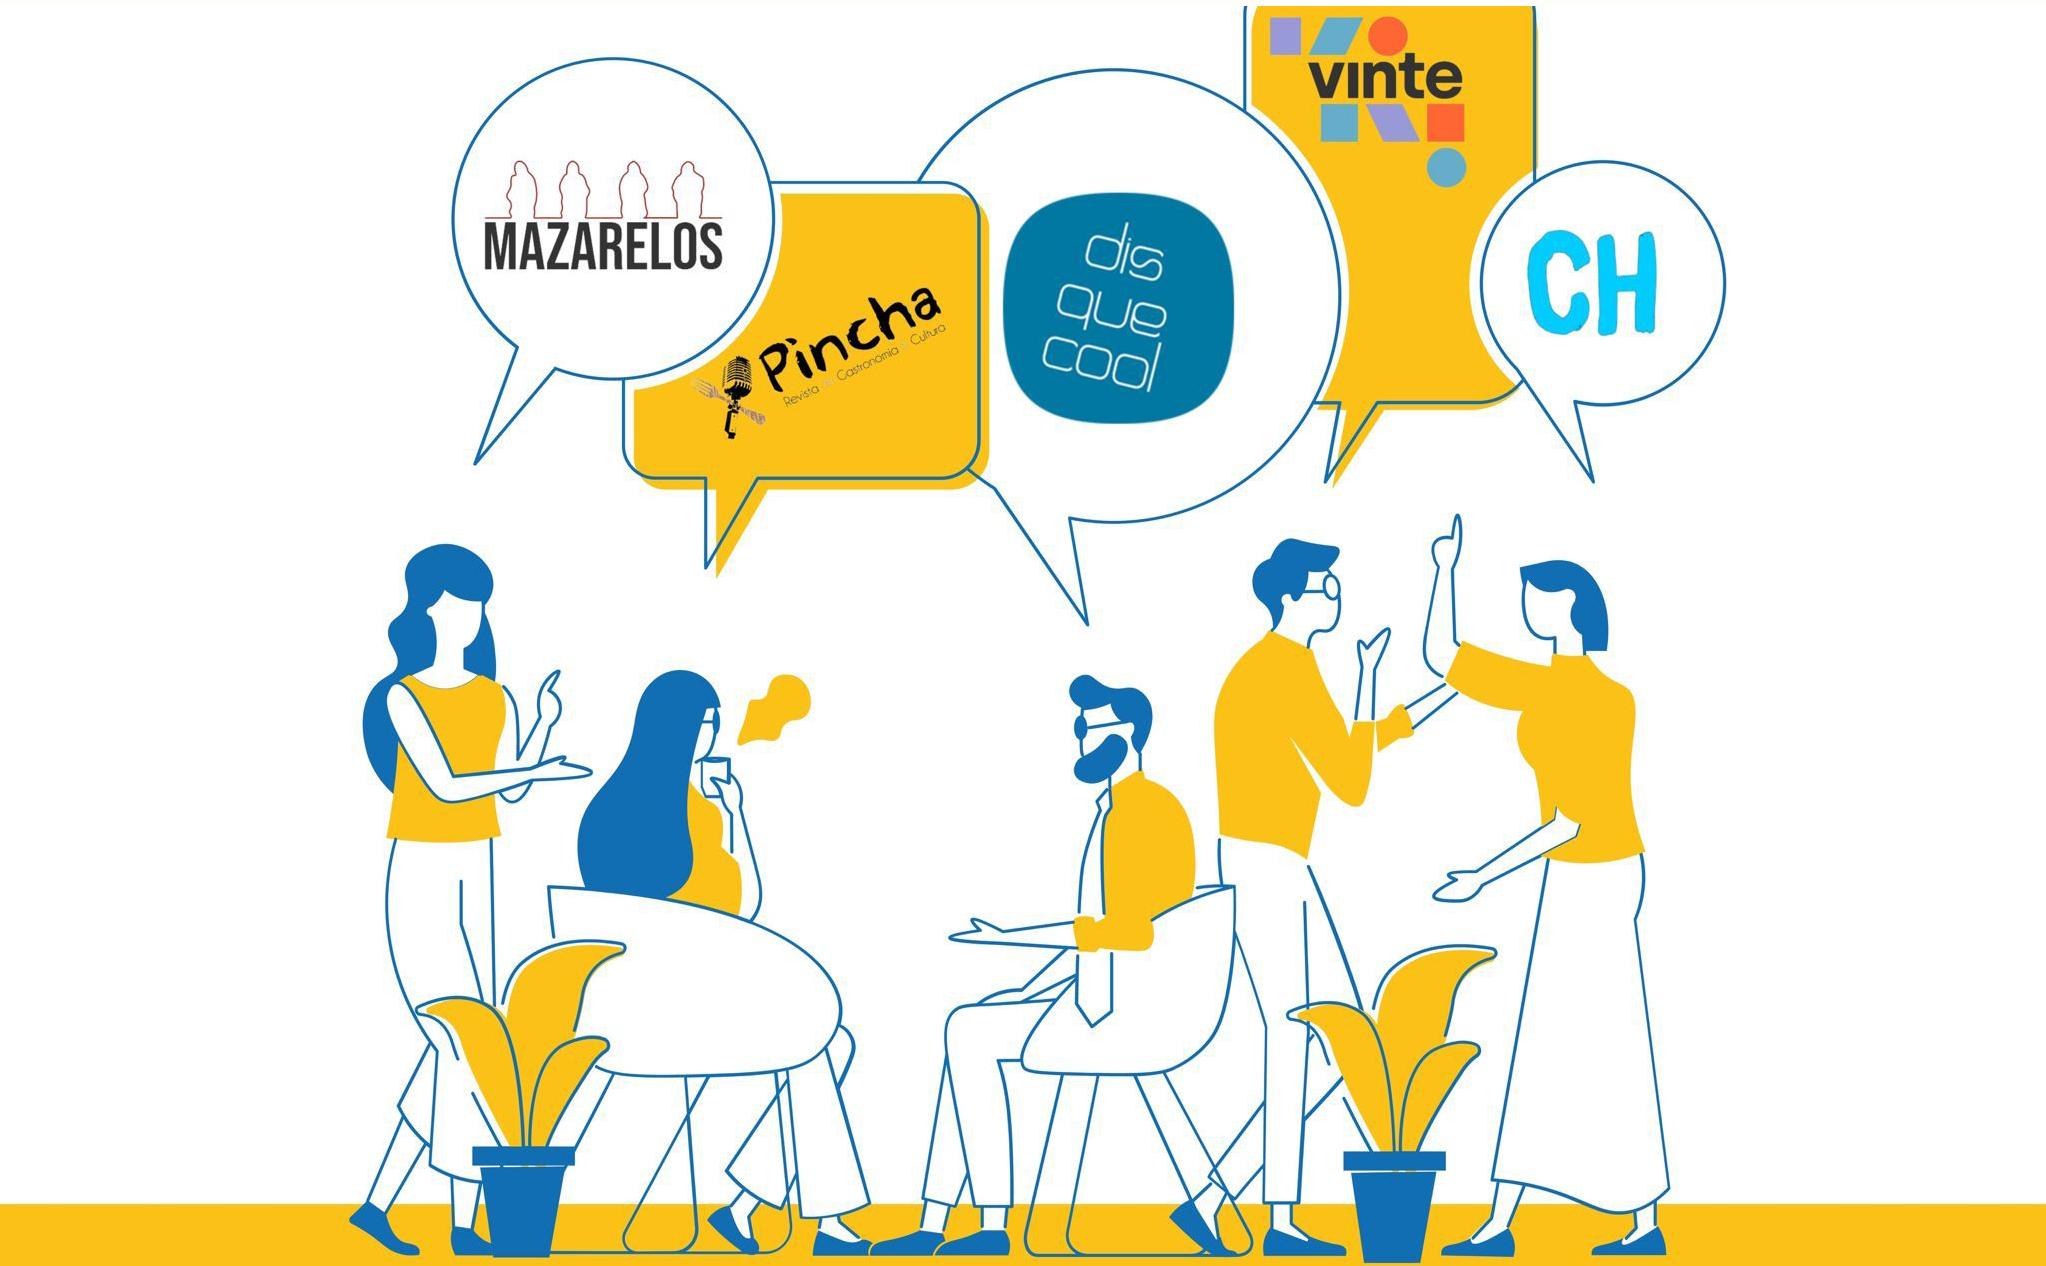 Novos medios galegos. A especialización importa